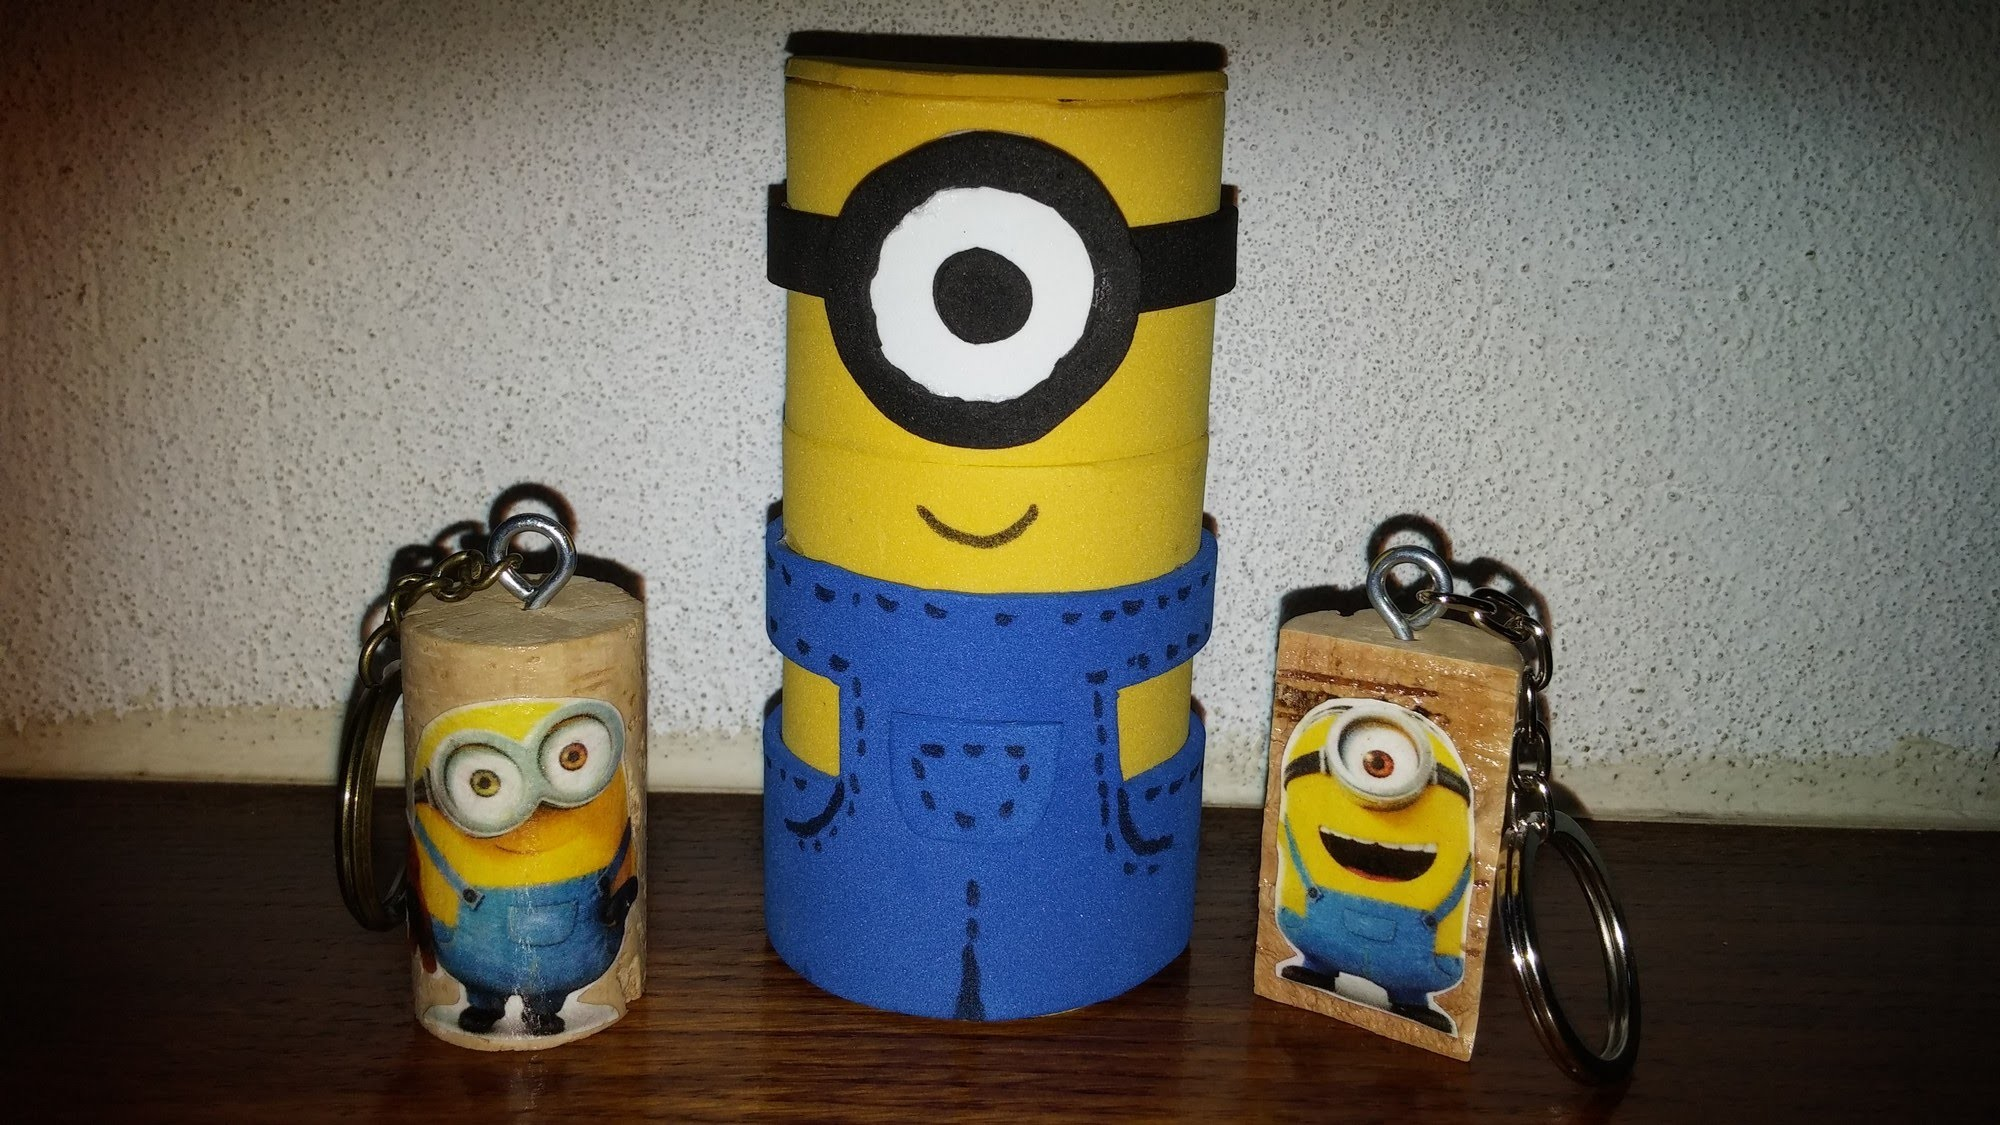 Minions de eva 3d com rolo de papel - DIY - Minion of eva and paper roll